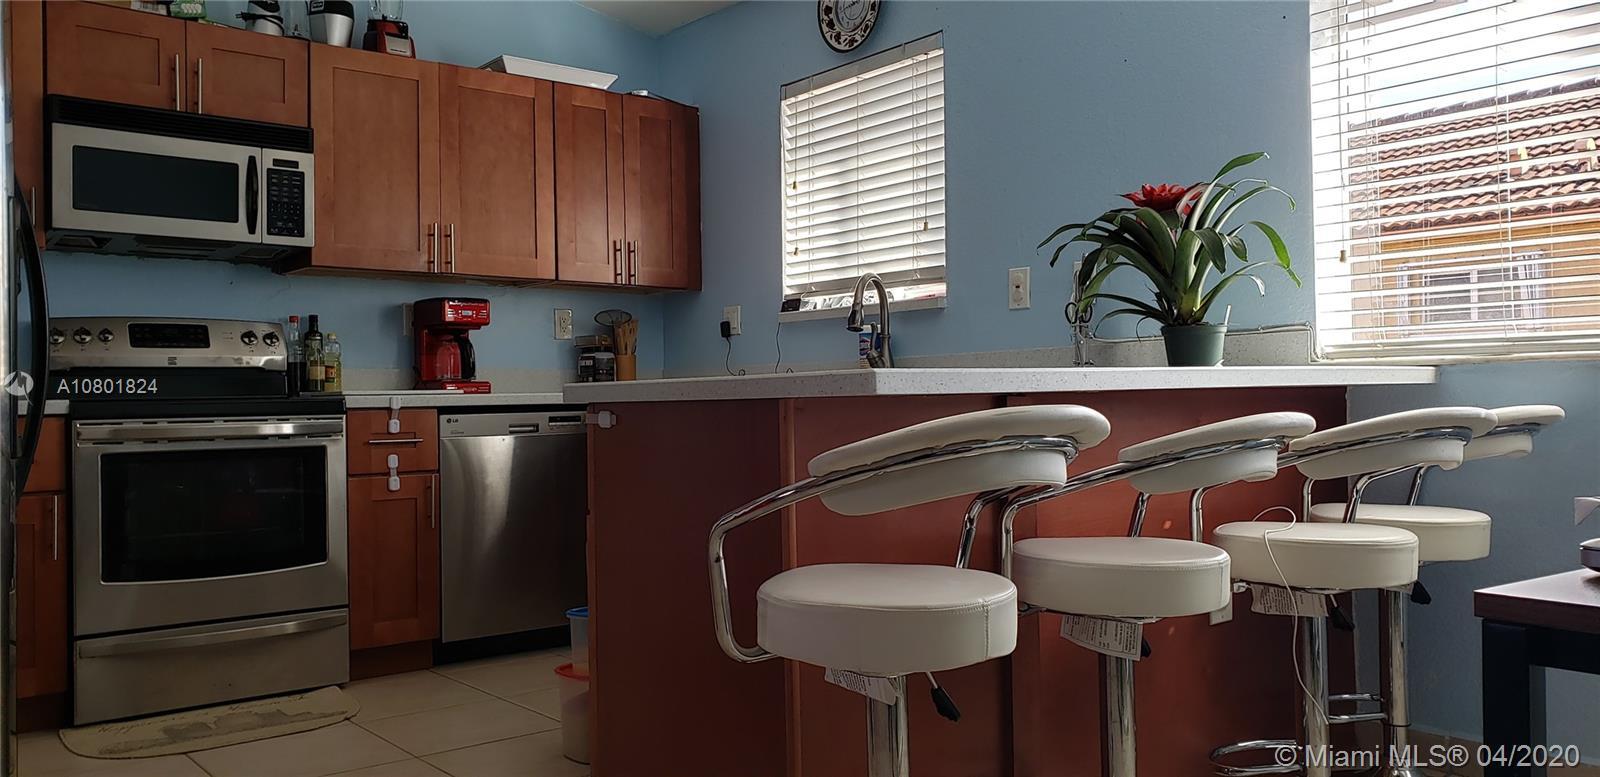 17318 NW 74th Ave #203, Hialeah, FL 33015 - Hialeah, FL real estate listing